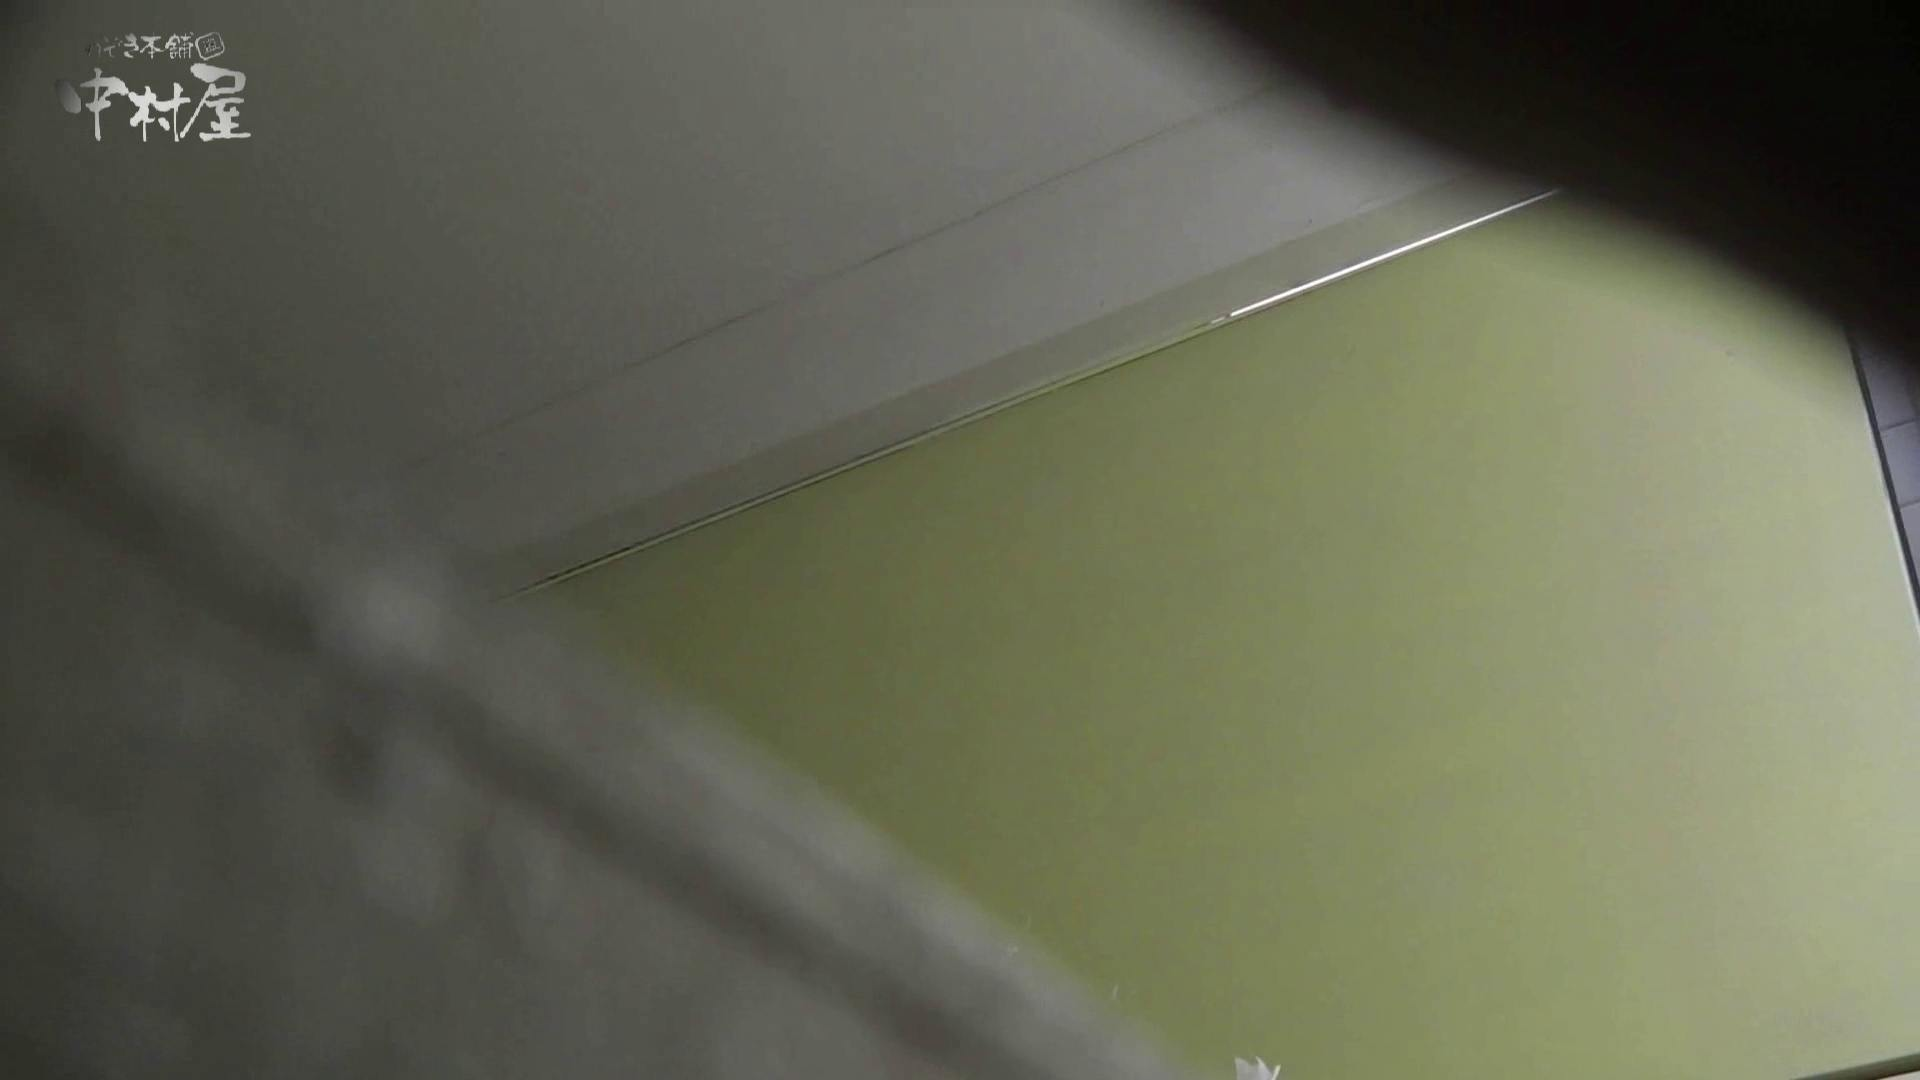 洗面所突入レポート!!vol.22 盗撮映像  66Pix 15